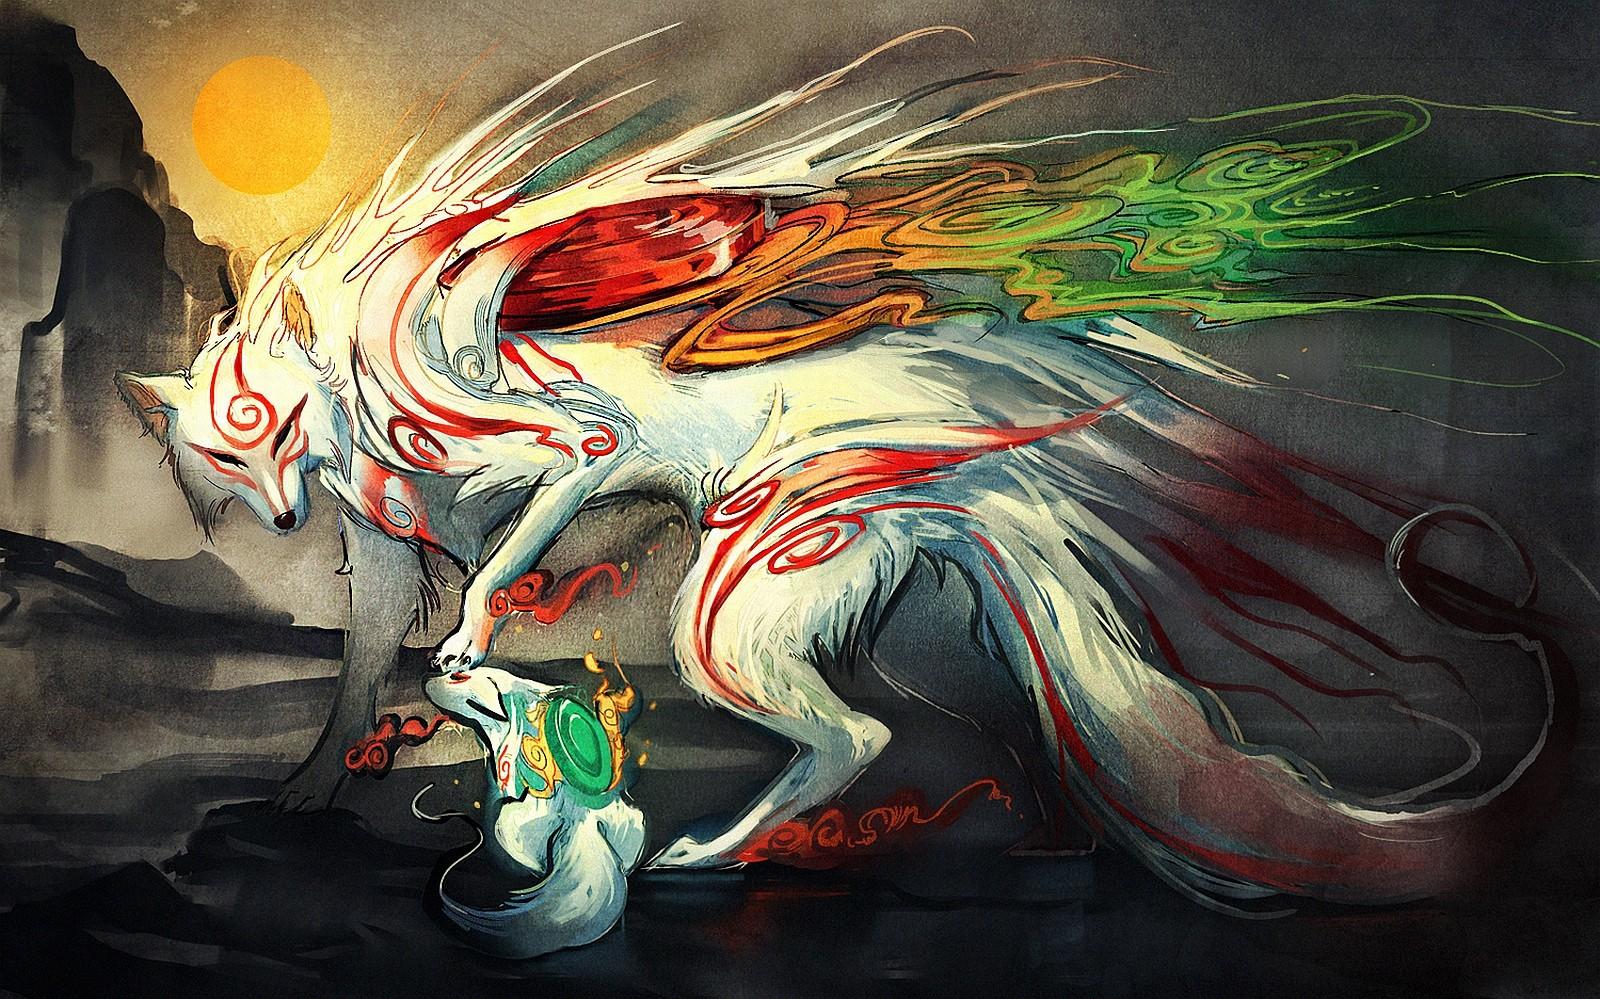 Hintergrundbilder Illustration Anime Comics Okami Kunst